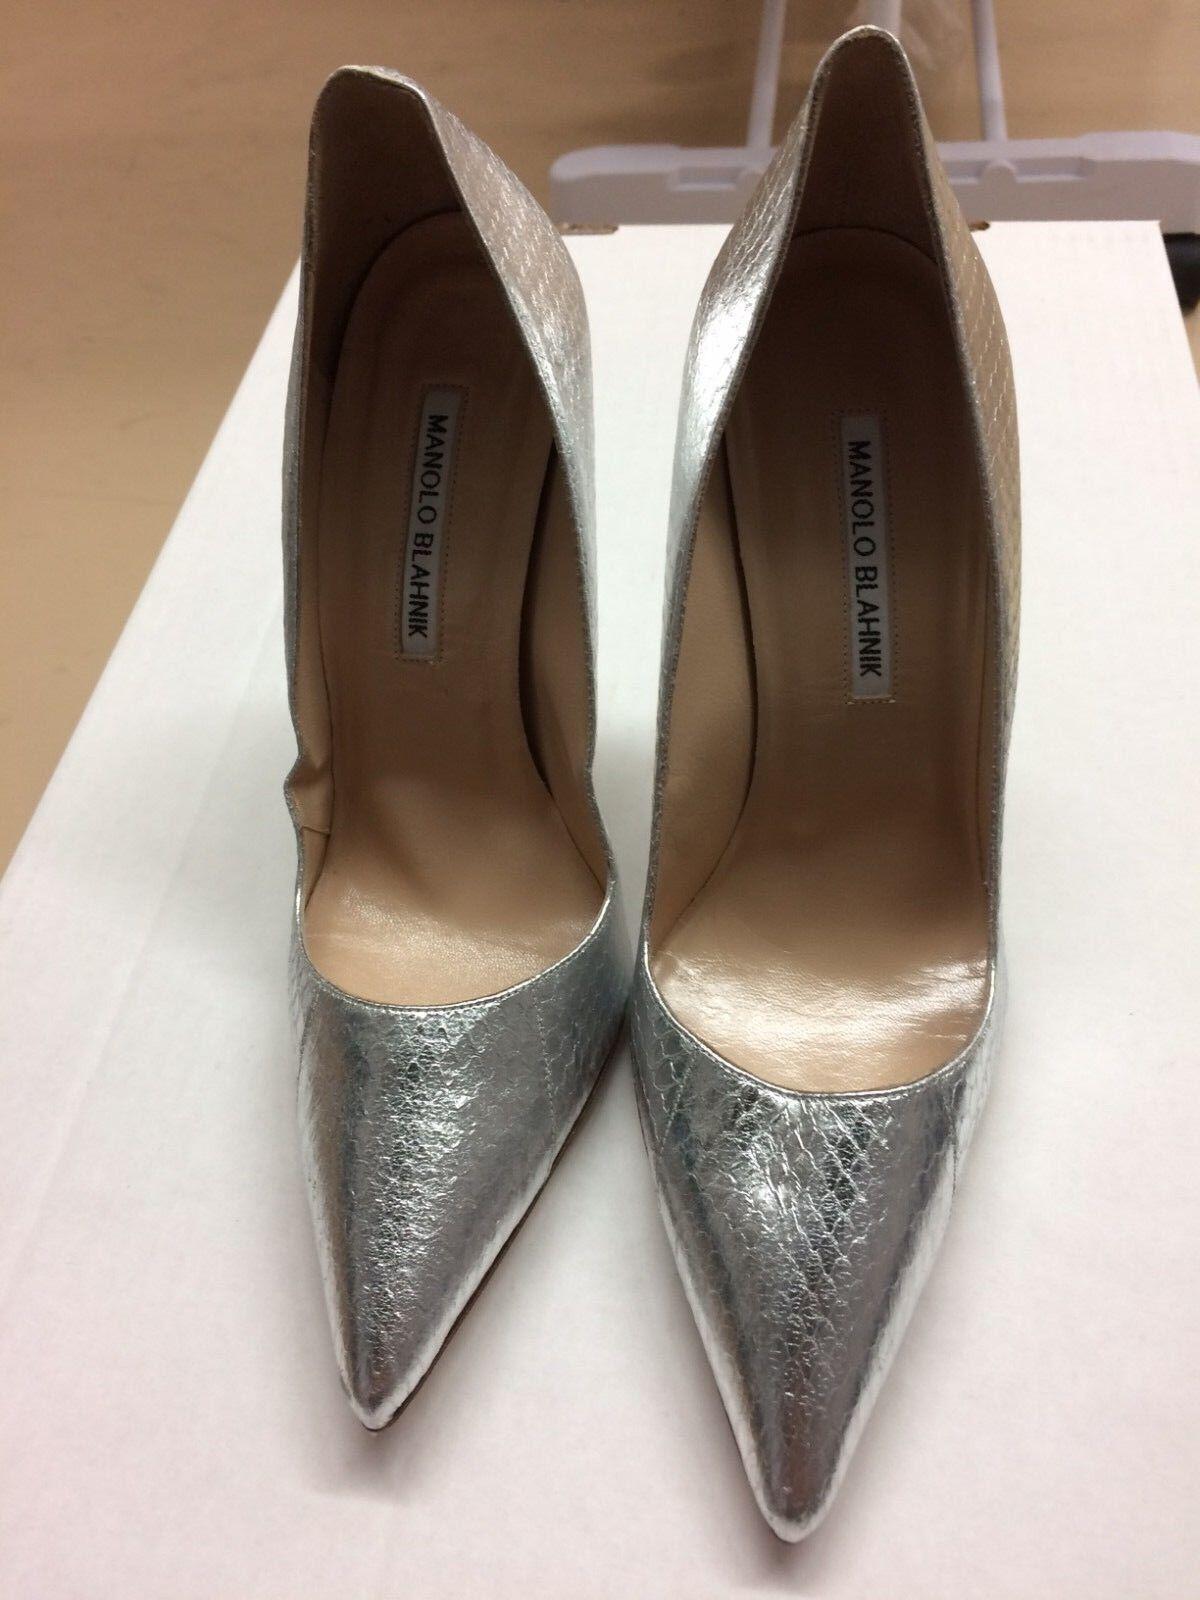 MANOLO BLAHNIK  935 Snakeskin BB Metallic argent argent argent GORGEOUS Pump chaussures Taille 39 NEW 33dffd